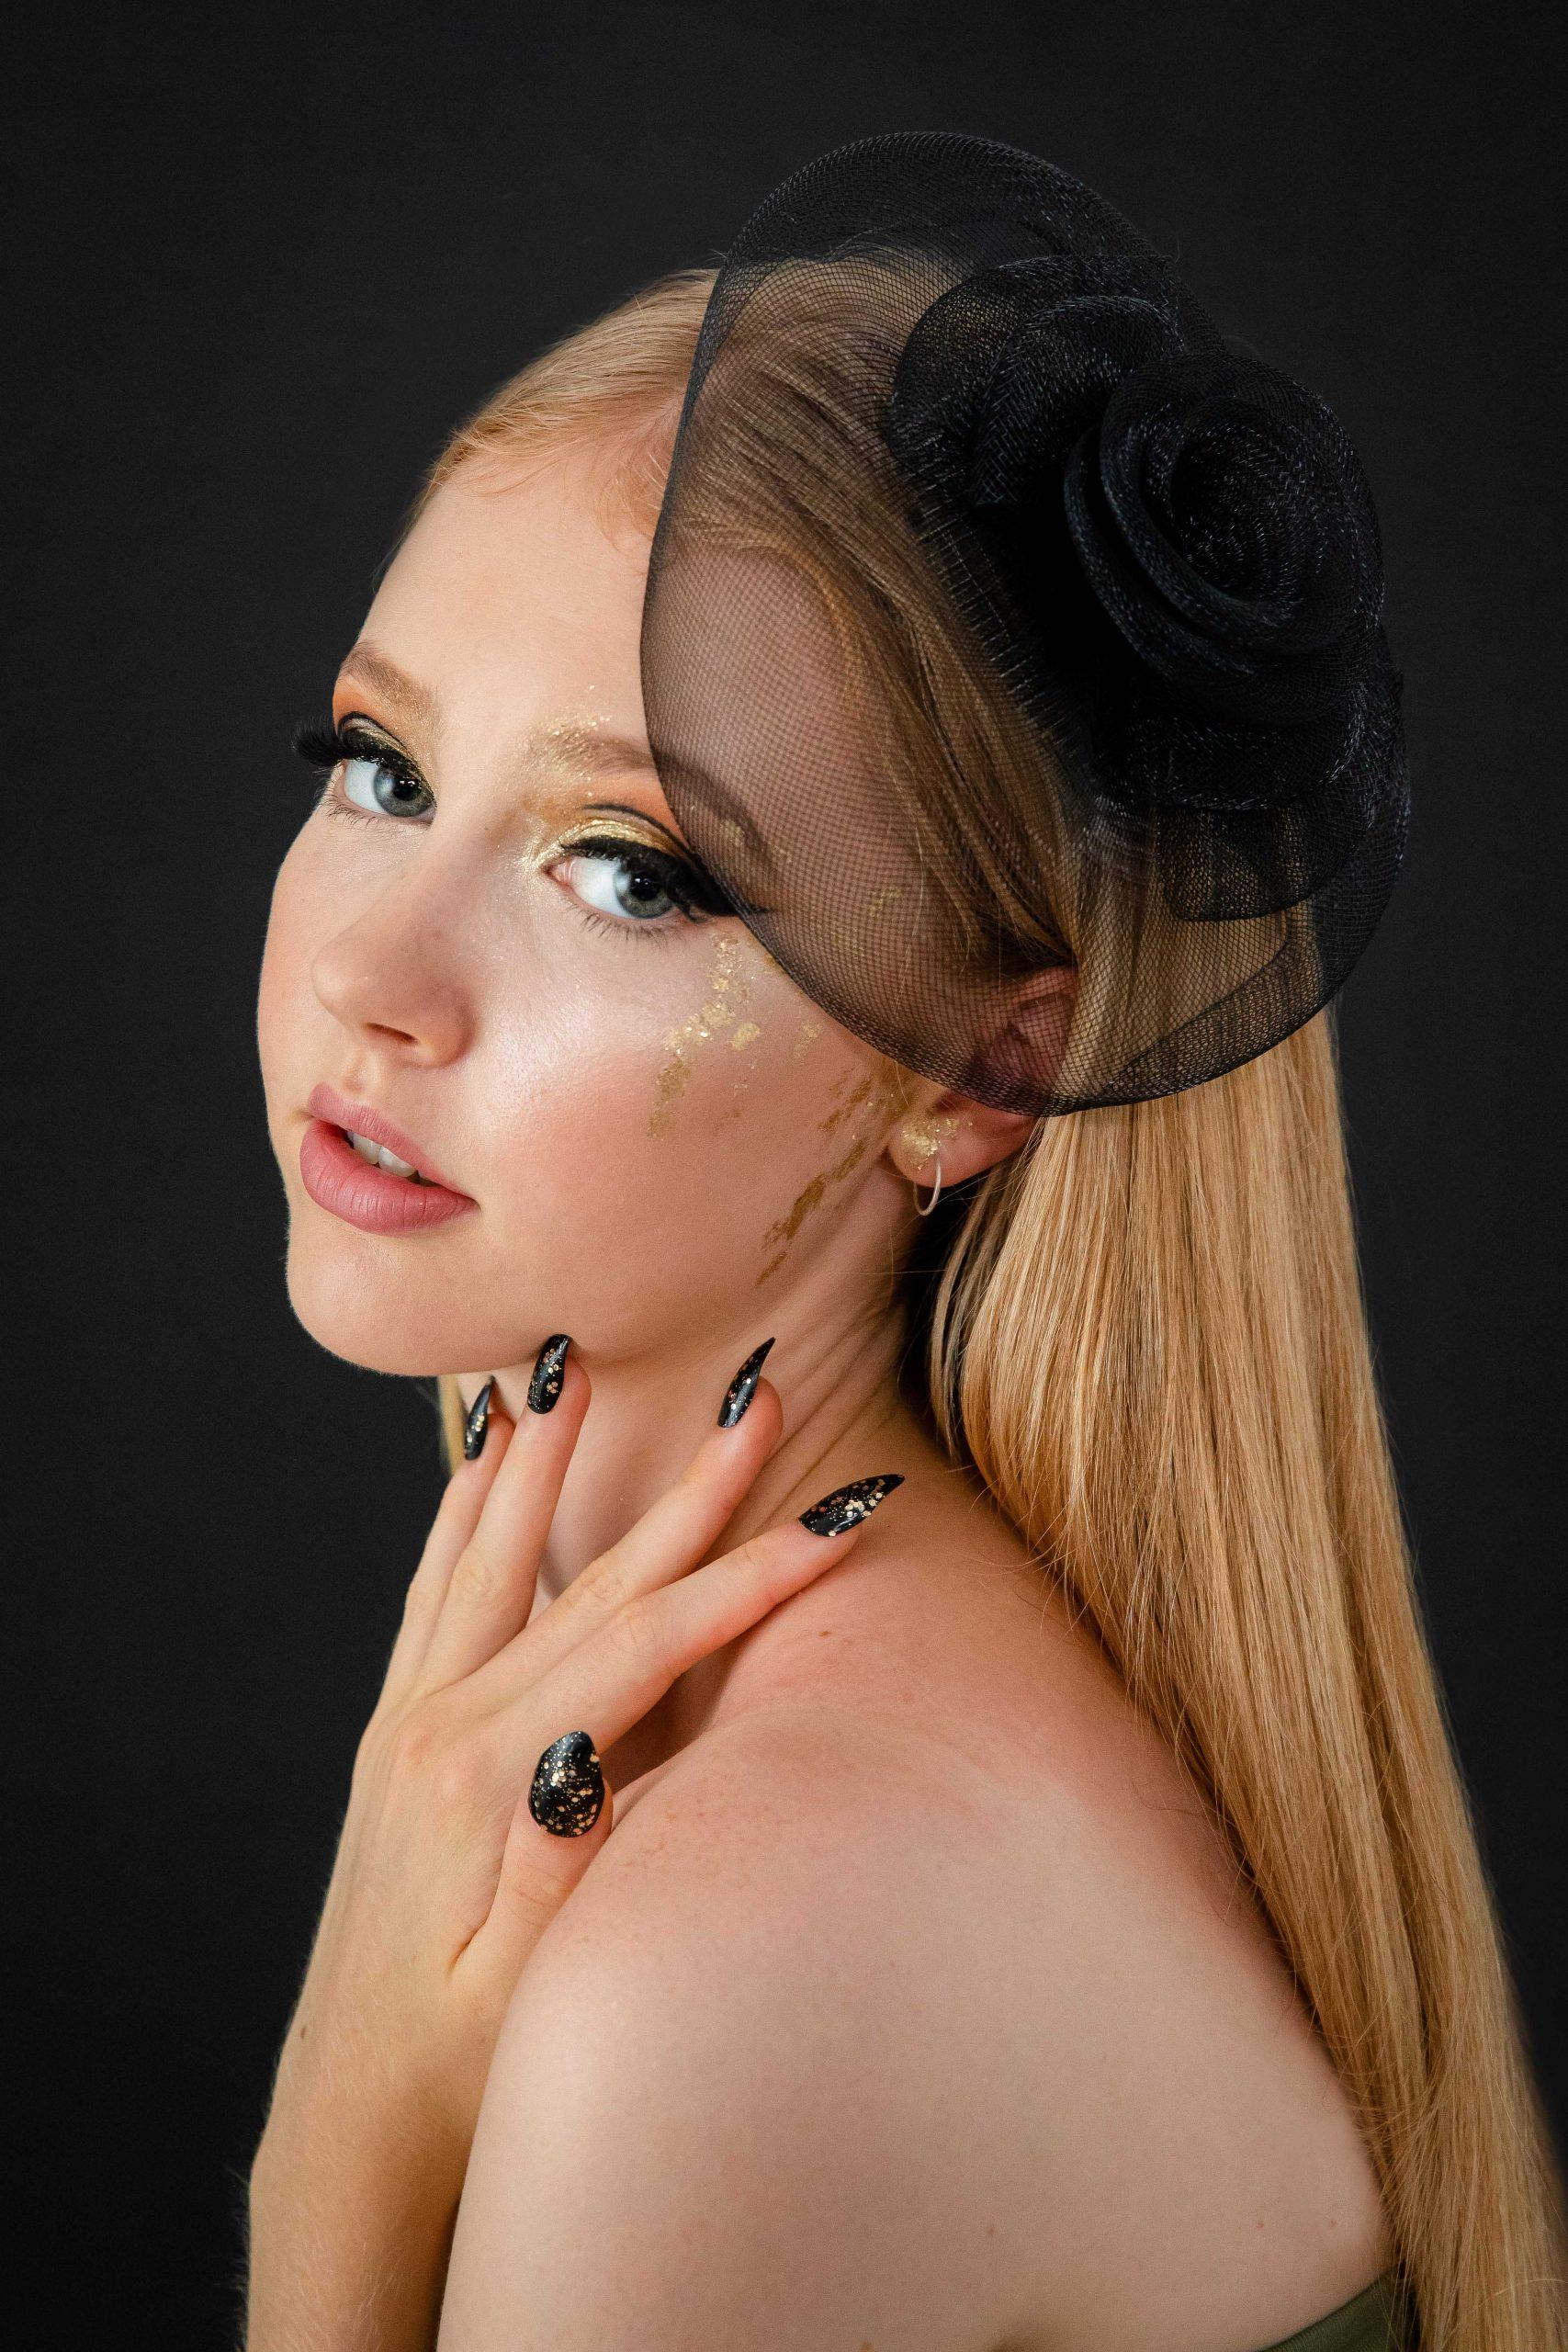 Brisbane Model Photographer, Fiona K Photography